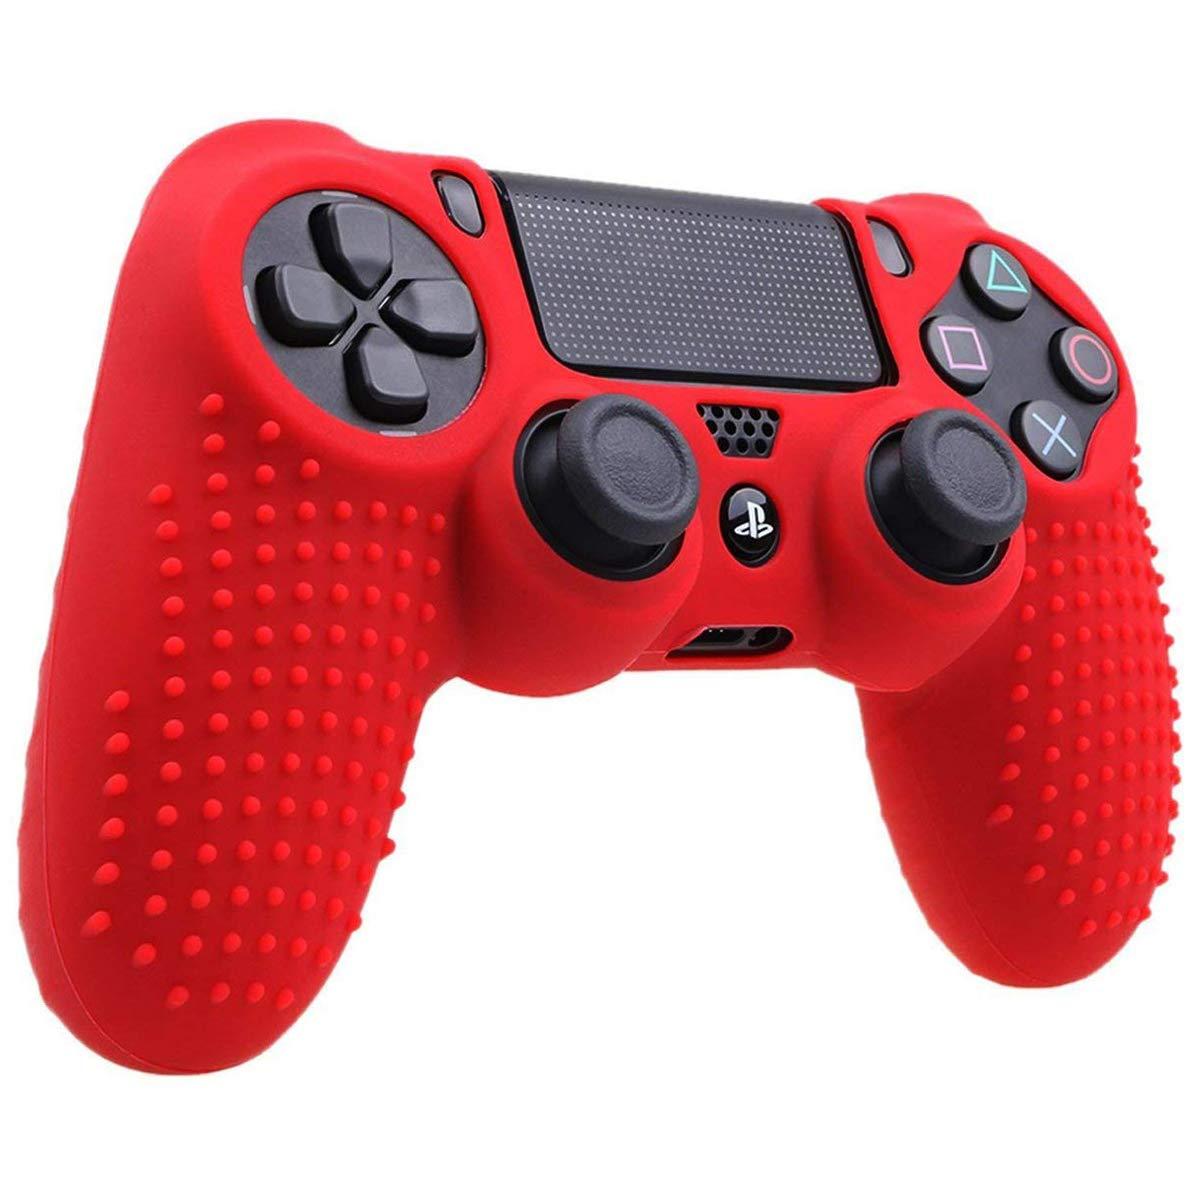 Accesorios para Consolas > Para PlayStation > Fundas para Joystick